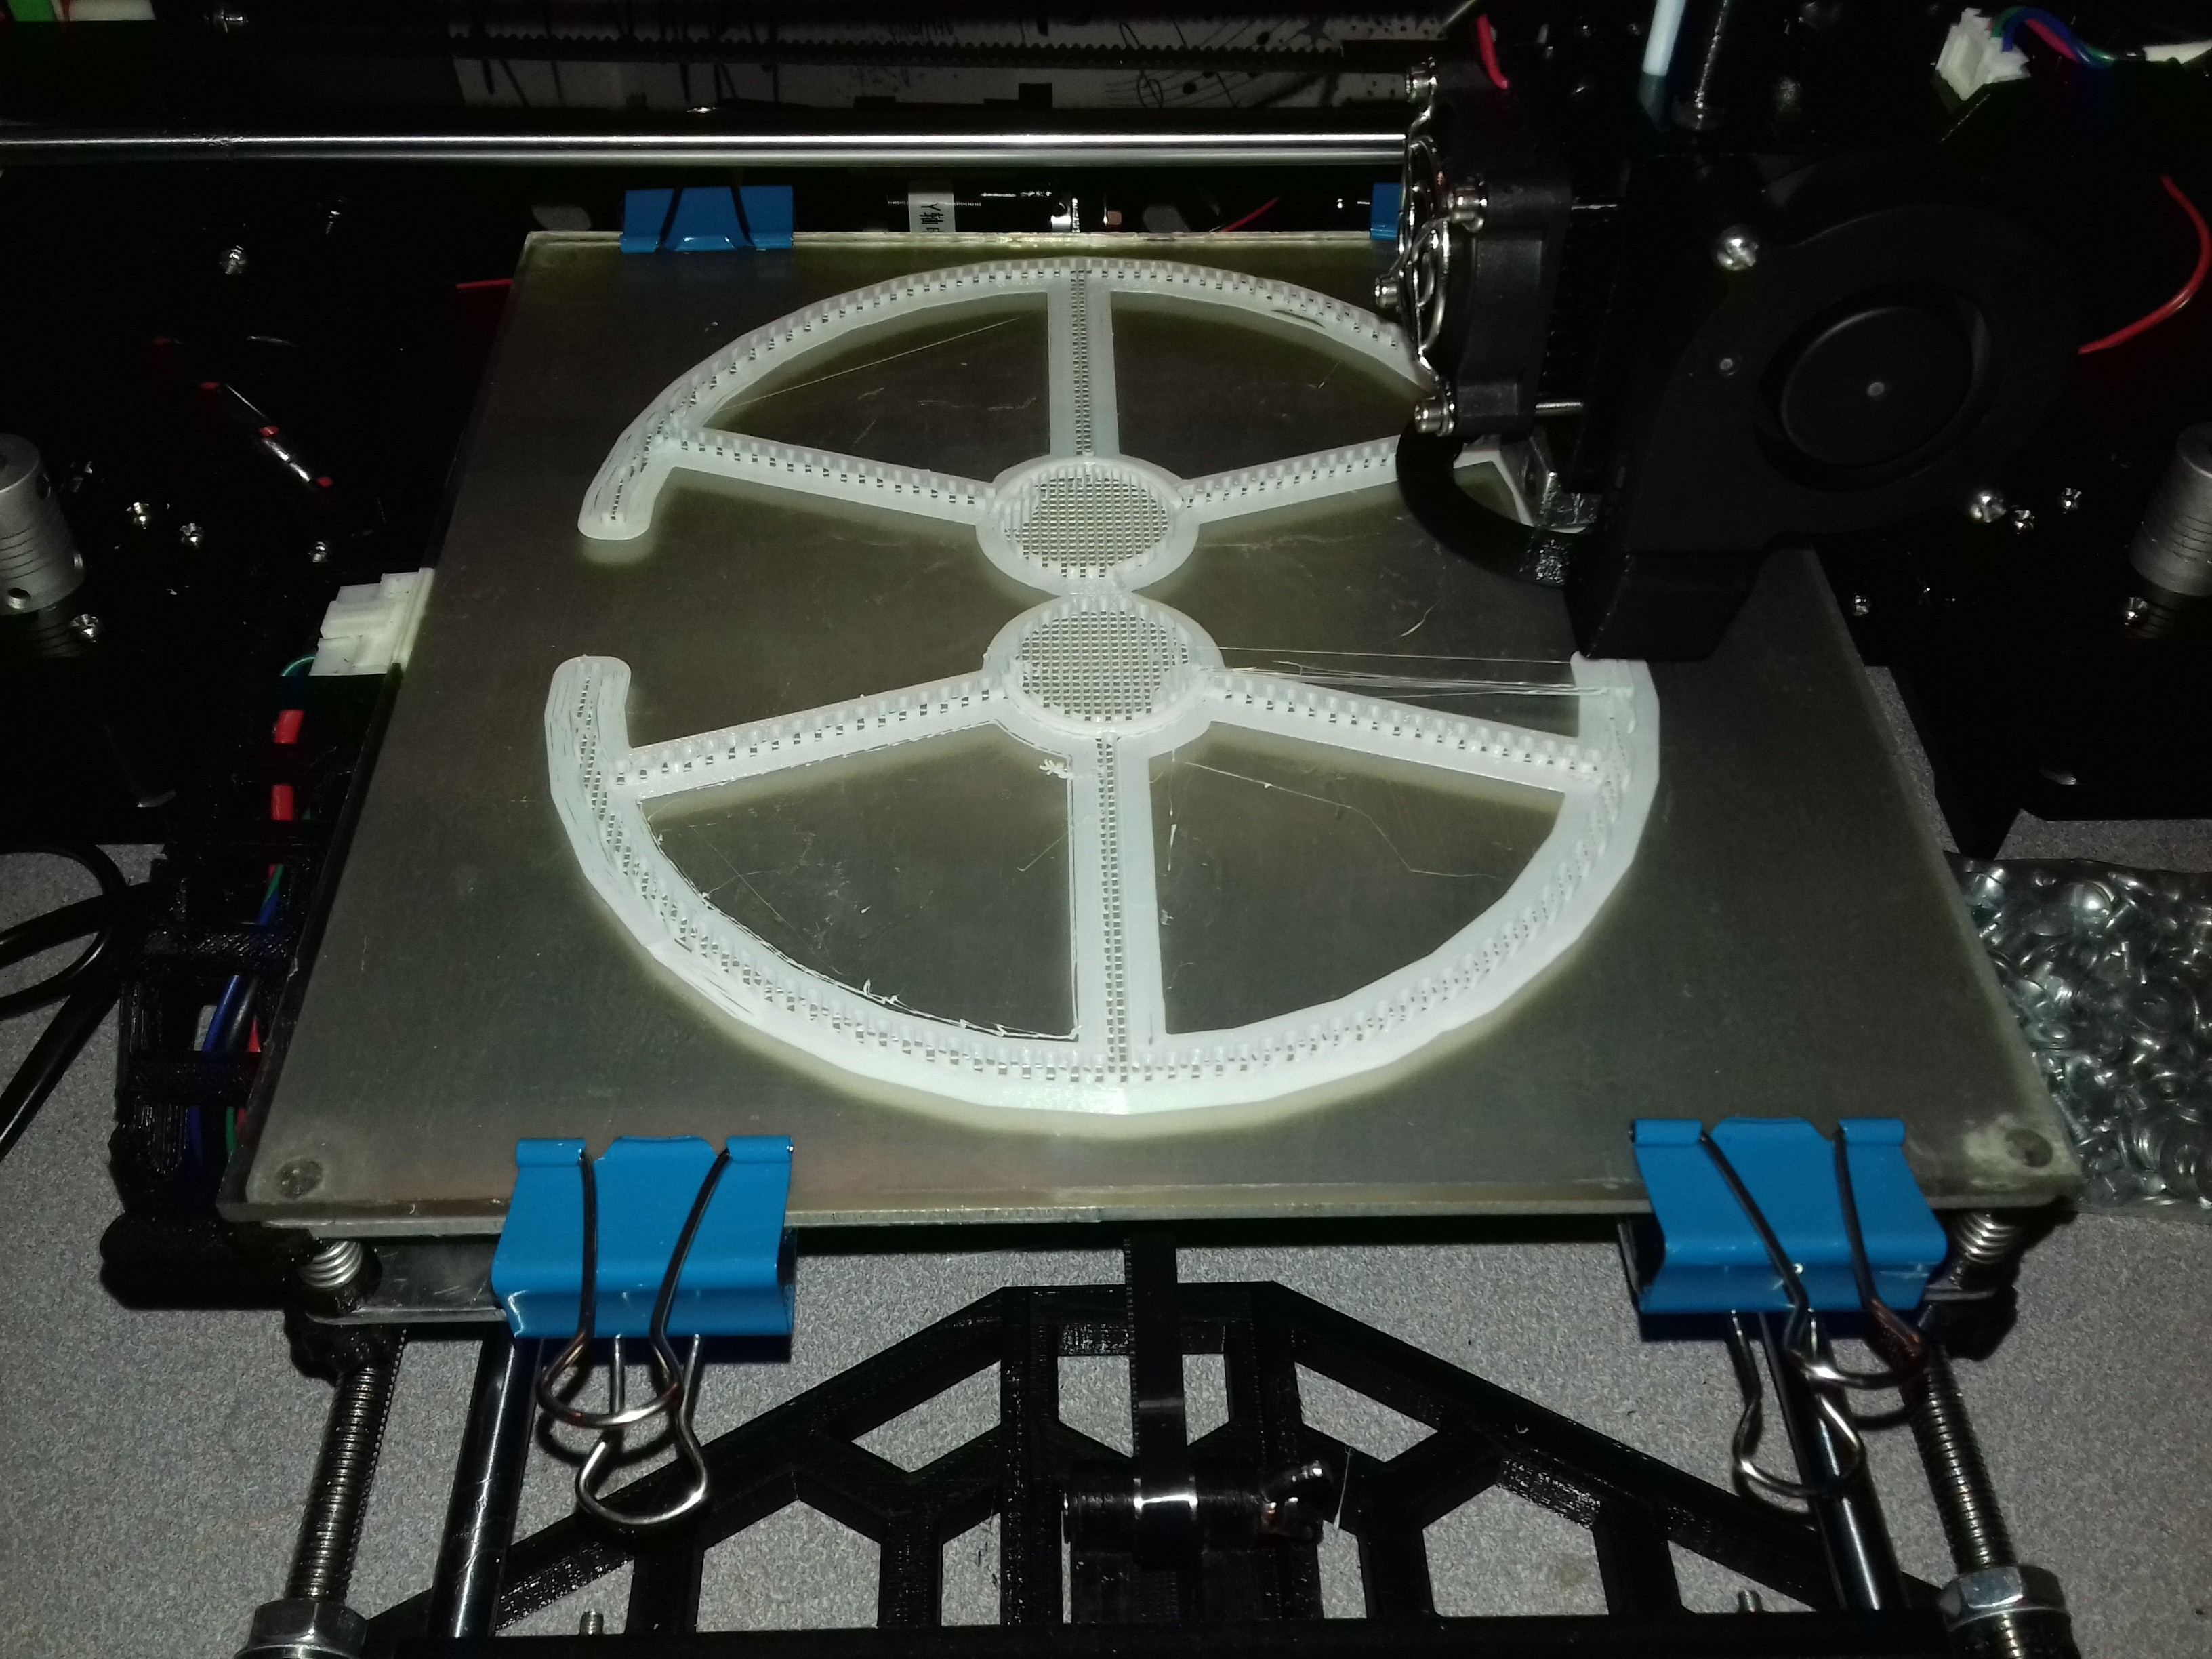 20171109_222729[1].jpg Download STL file Walkera F210 propeller guard • 3D printer object, Minkus